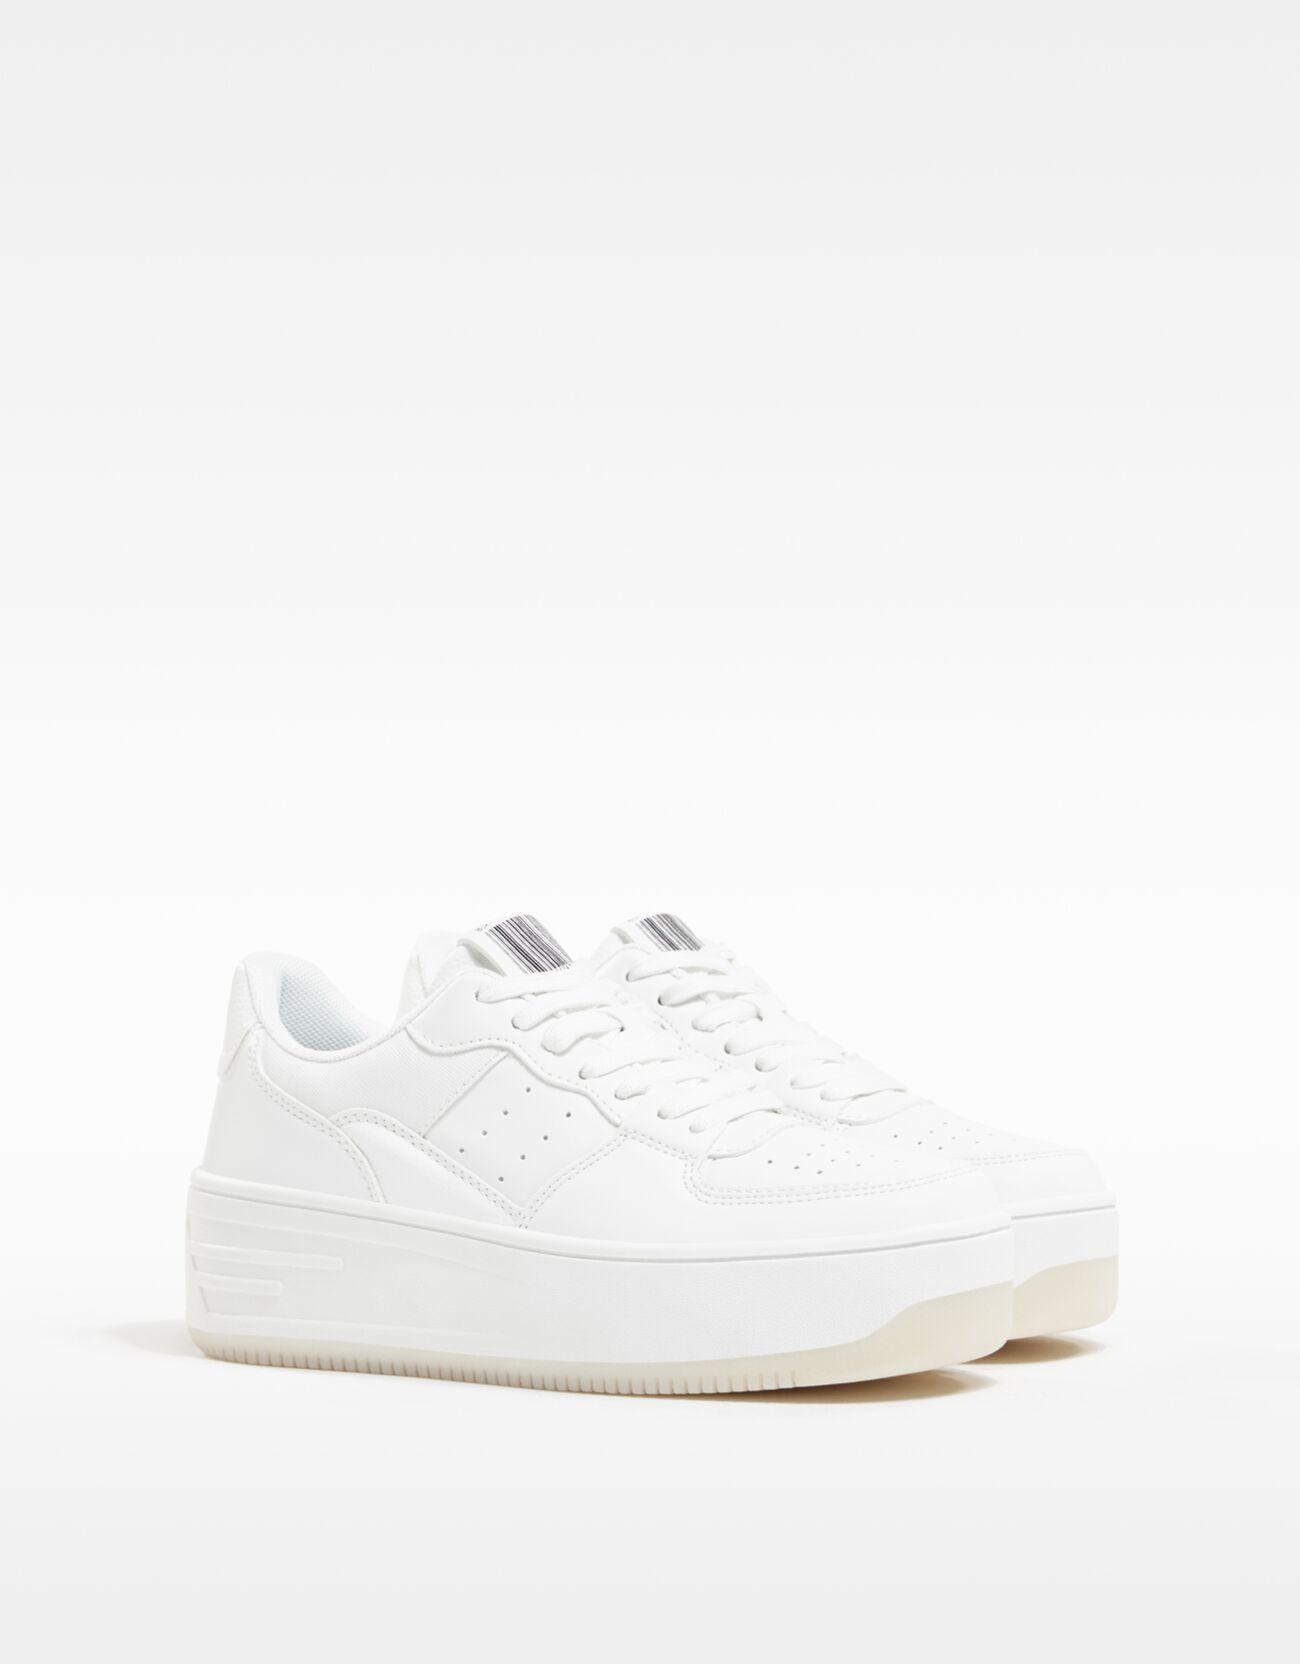 bershka -  Plateau-Sneaker Mit Broguing-Details. Damen 37 Weiss